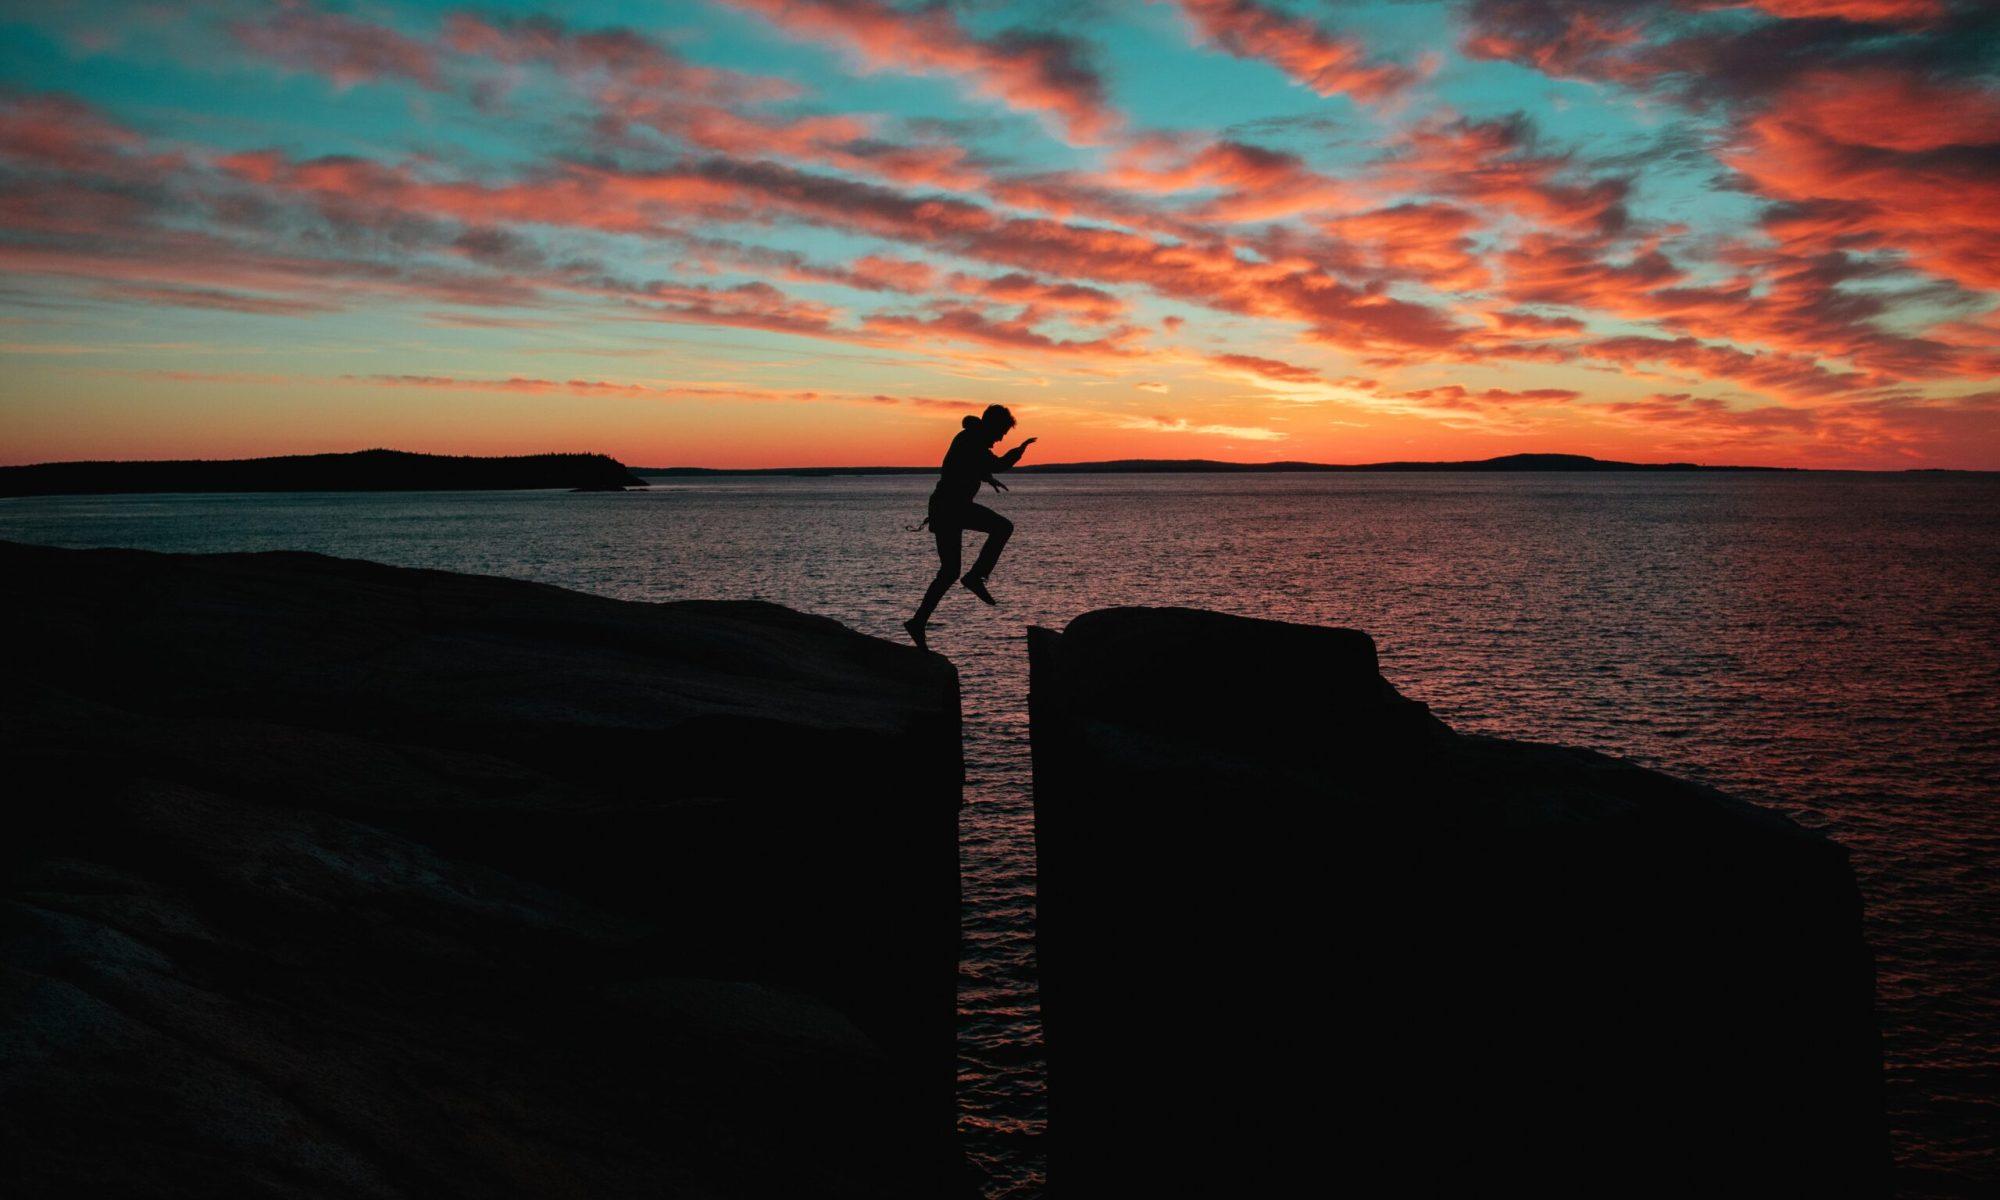 Progress, self-help, movement